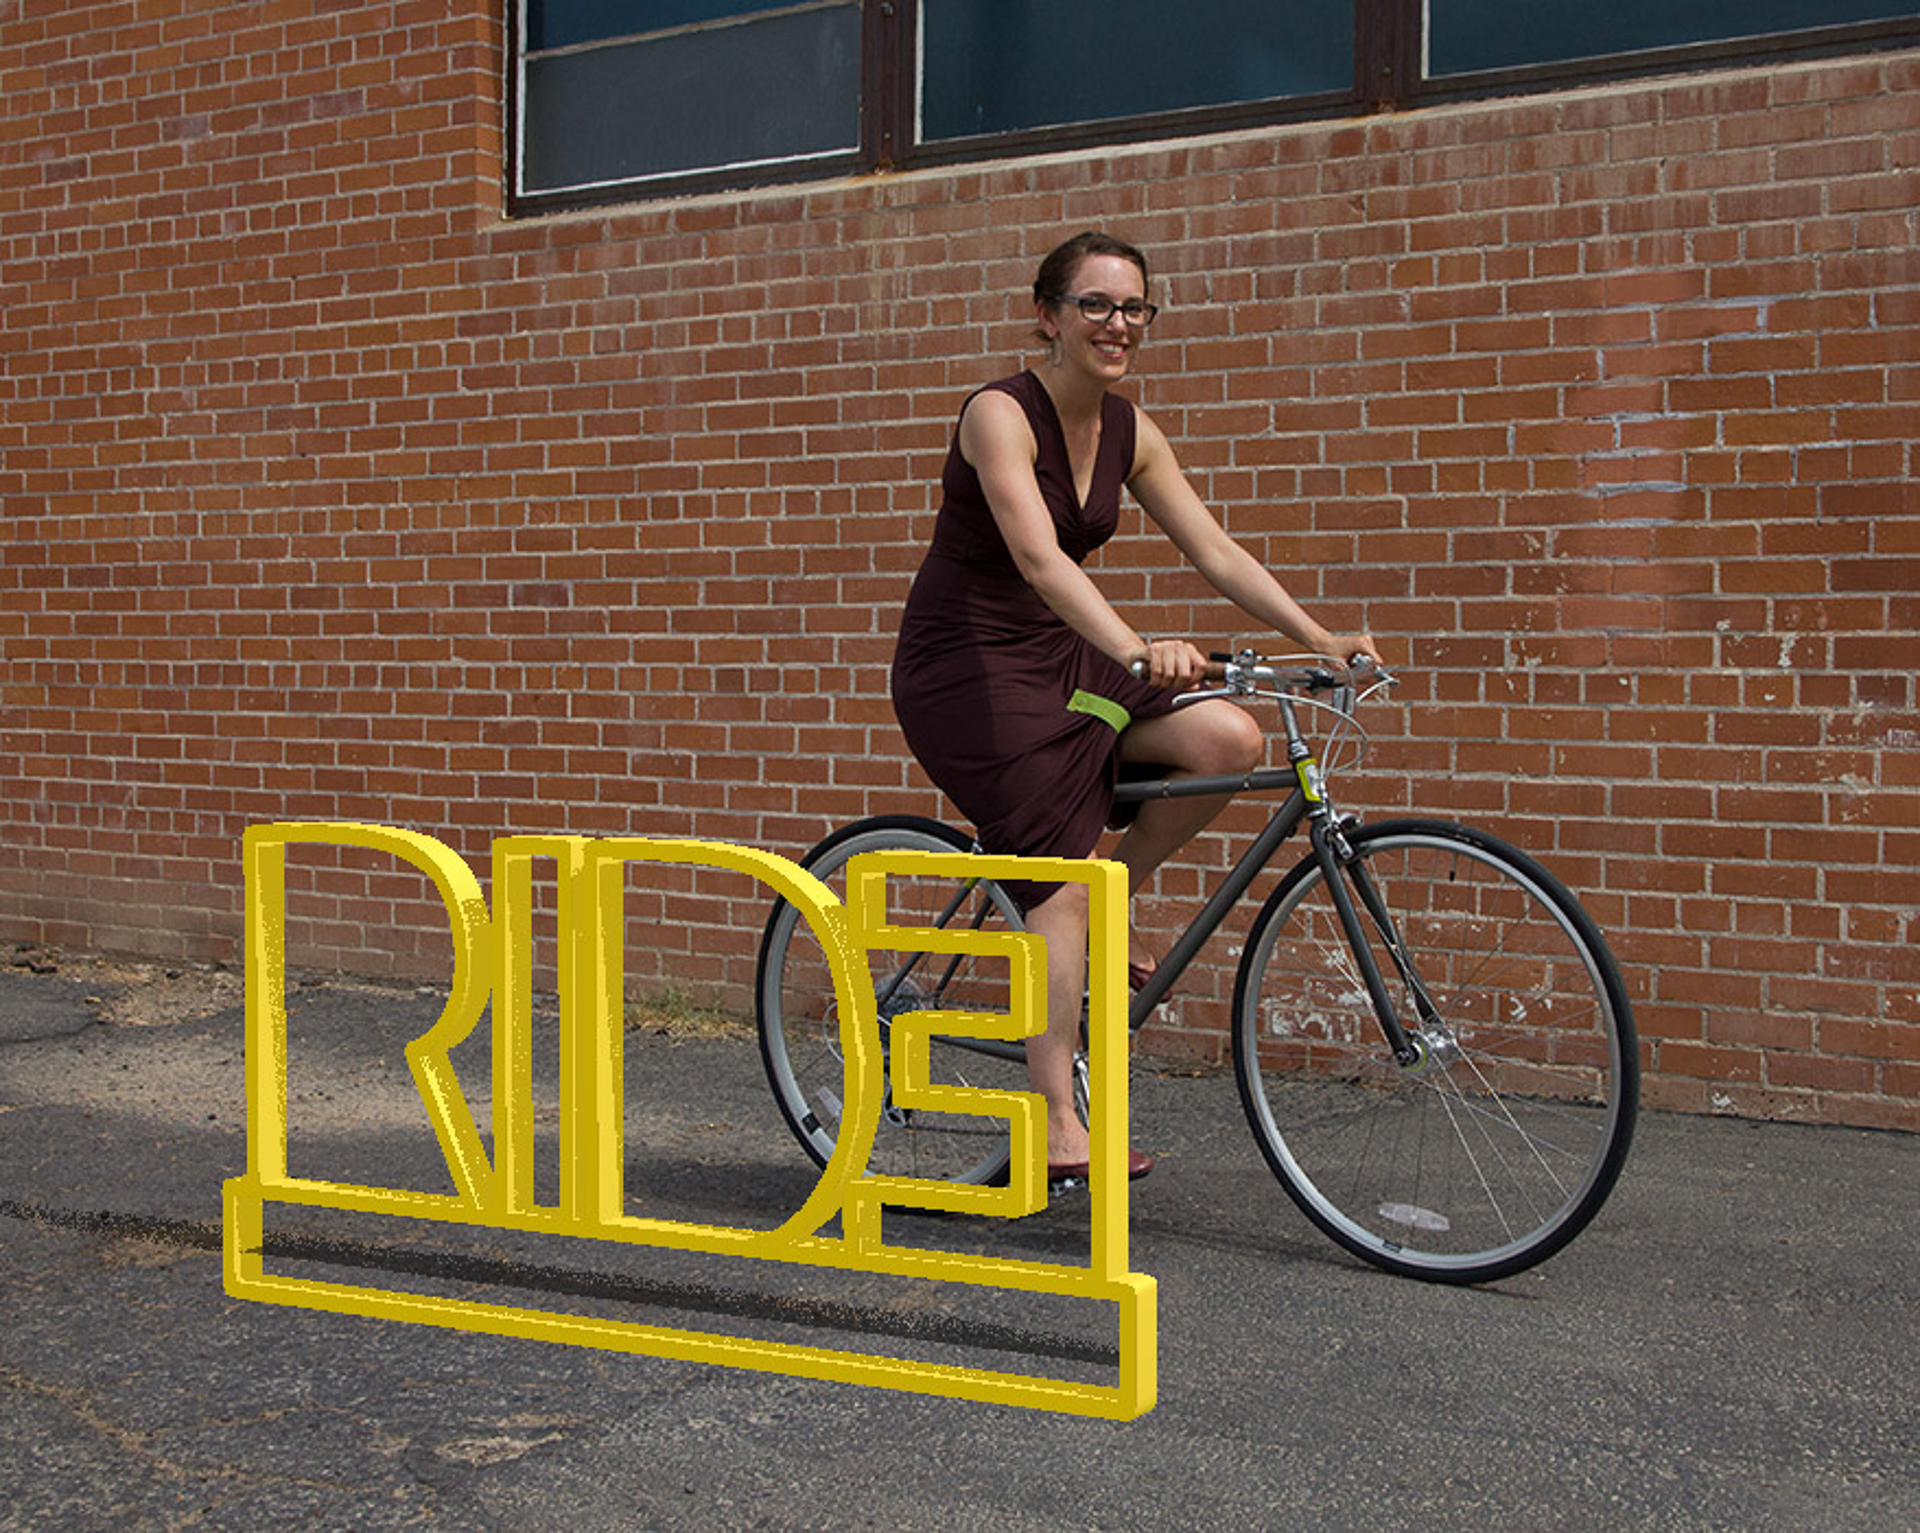 riderack-2.jpg